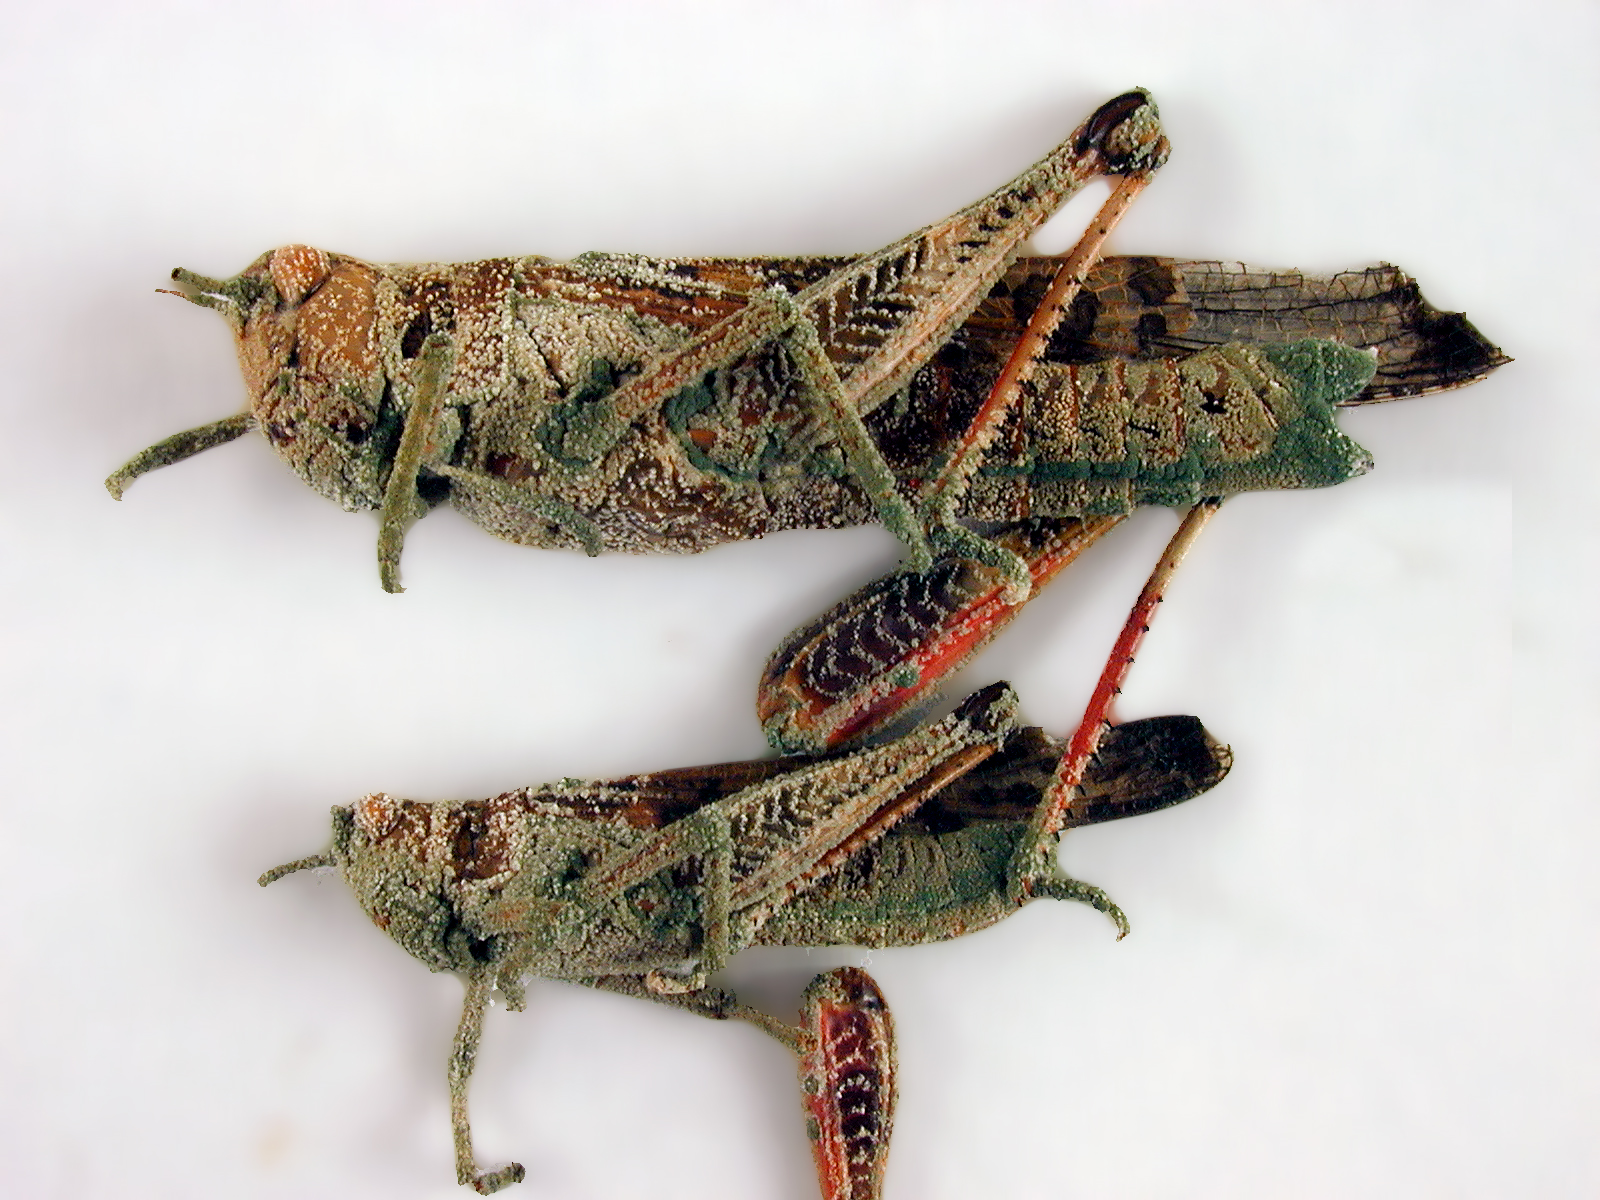 File:CSIRO ScienceImage 1367 Locusts attacked by the fungus Metarhizium.jpg